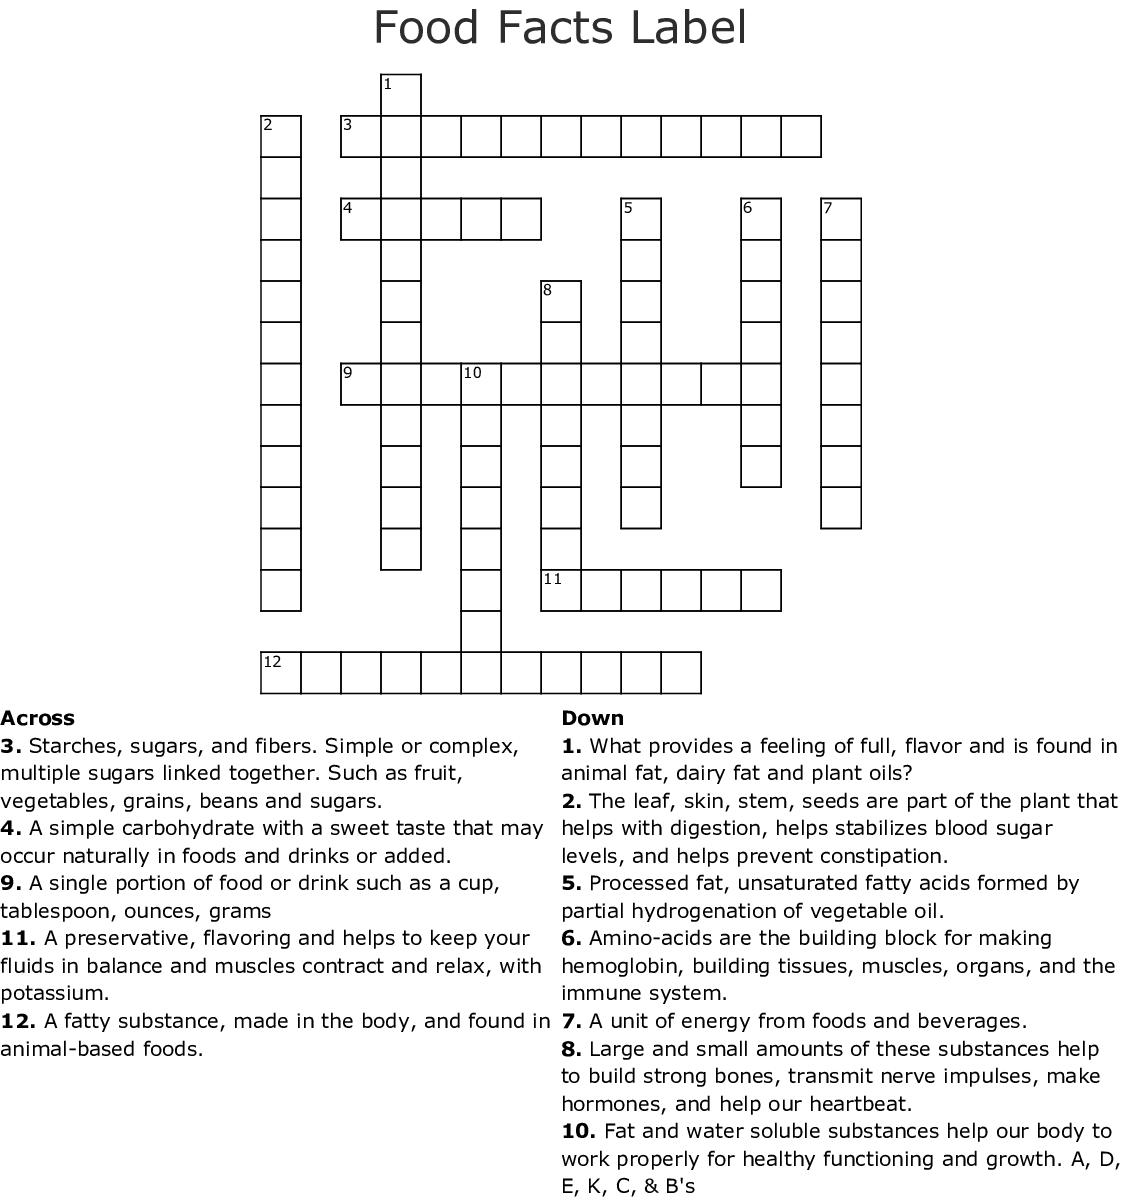 Food Facts Label Crossword